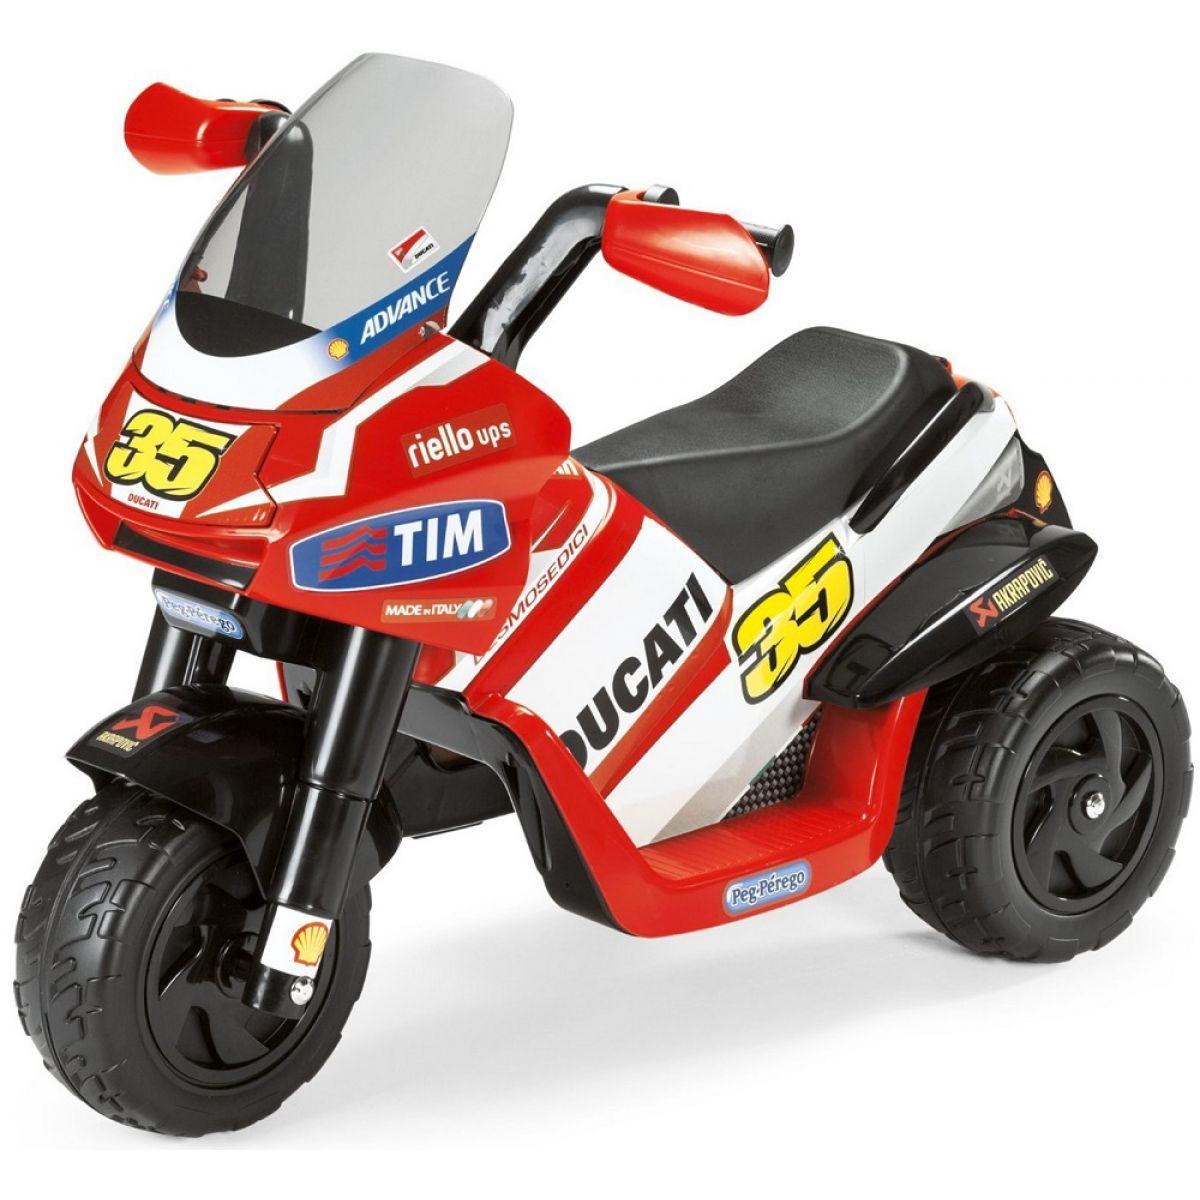 Peg-Pérego Ducati Desmosedici Raider červená